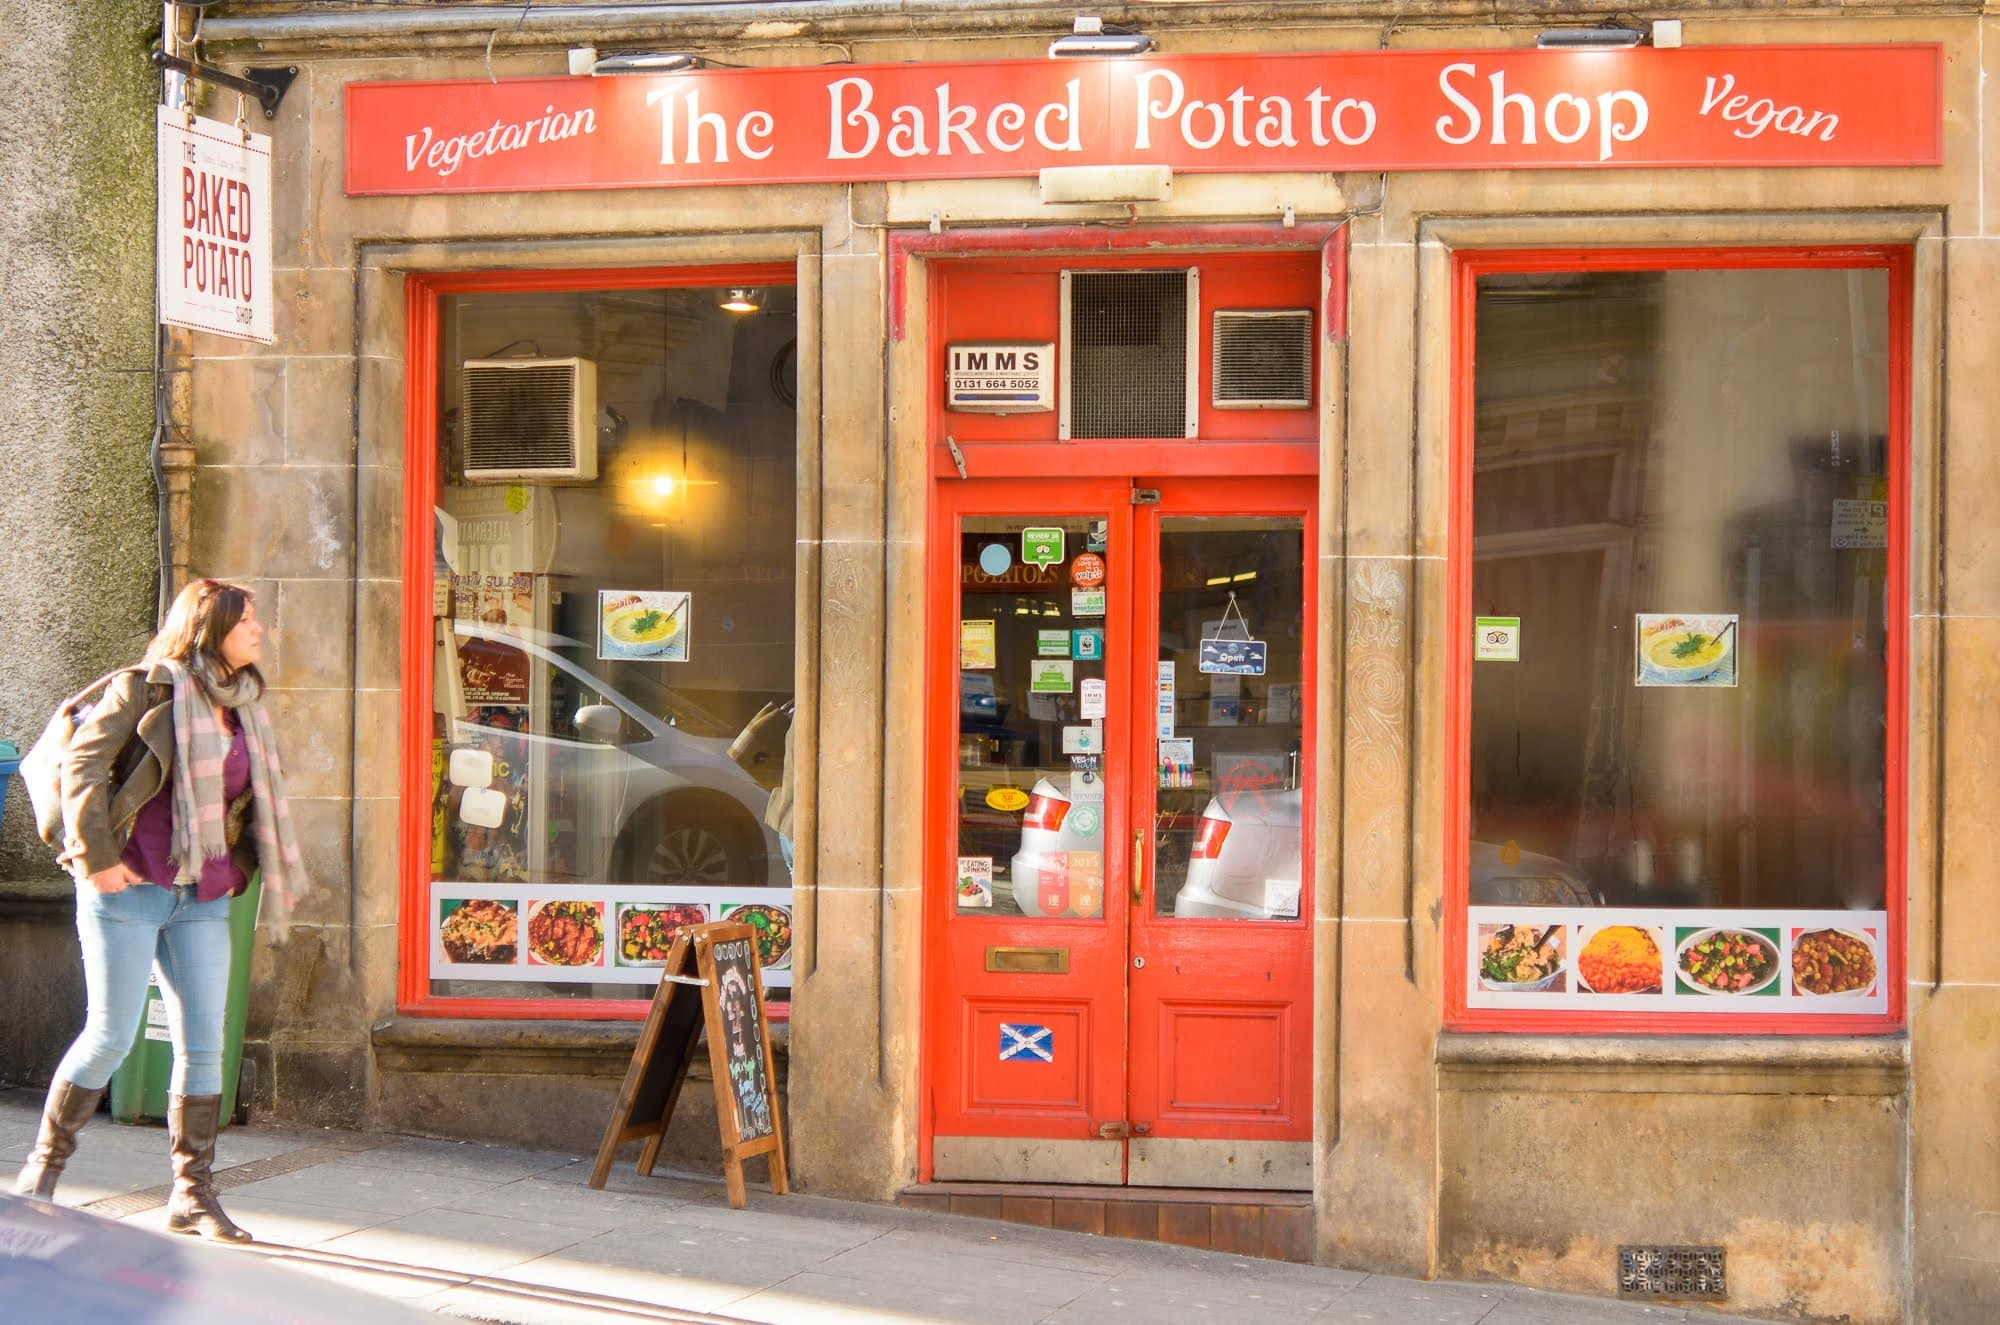 The outside of the Baked Potato Shop